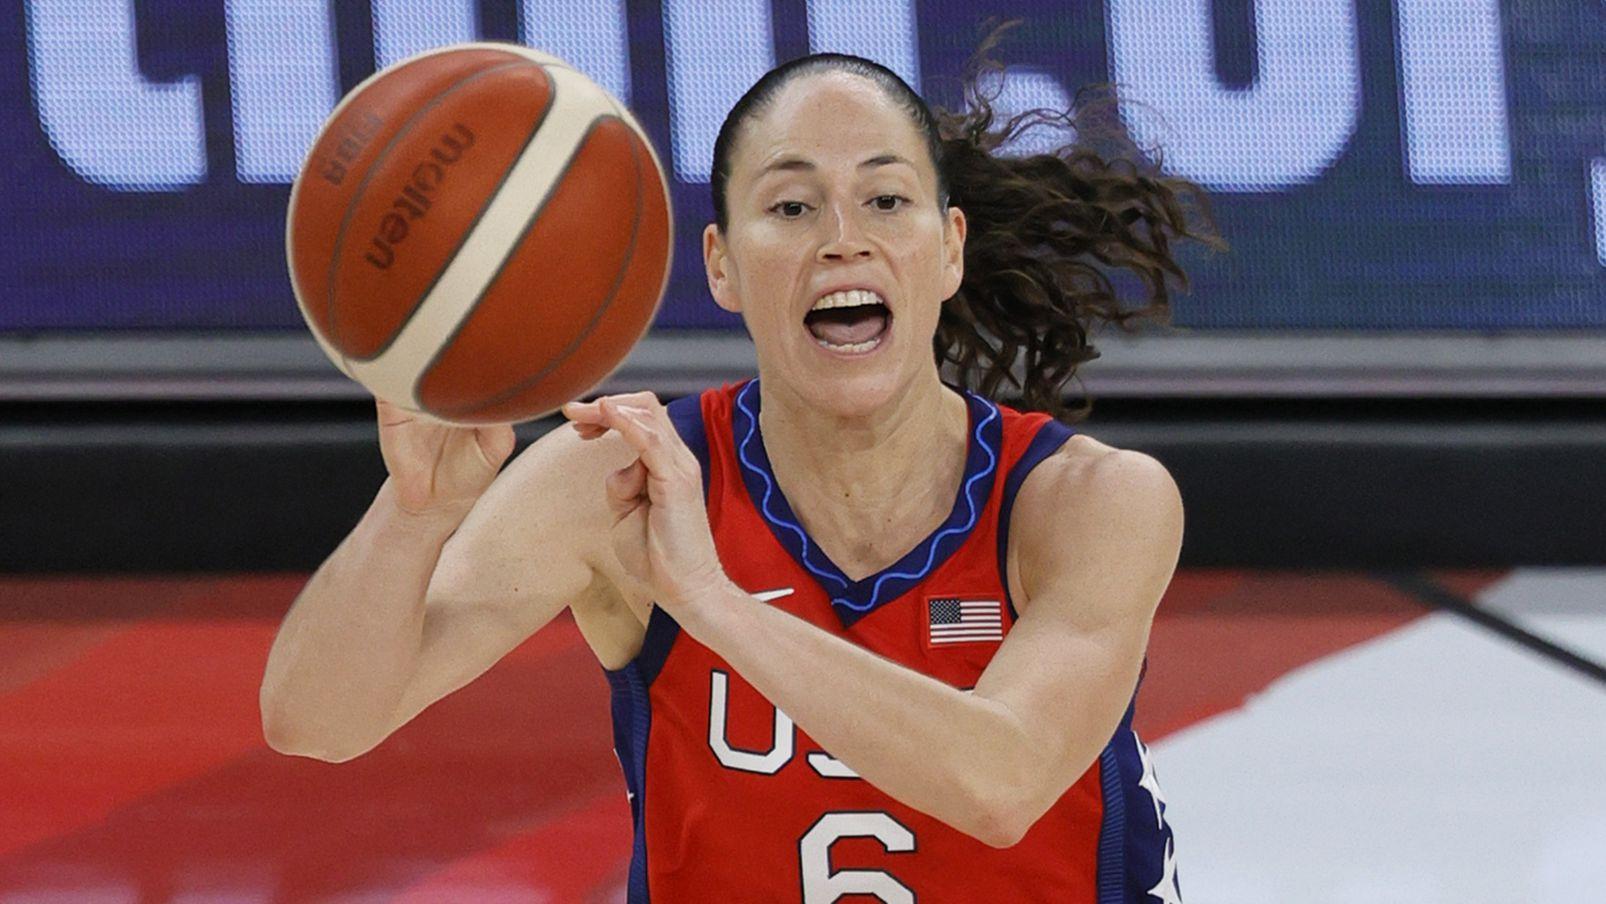 USA star defends team for walking back protest